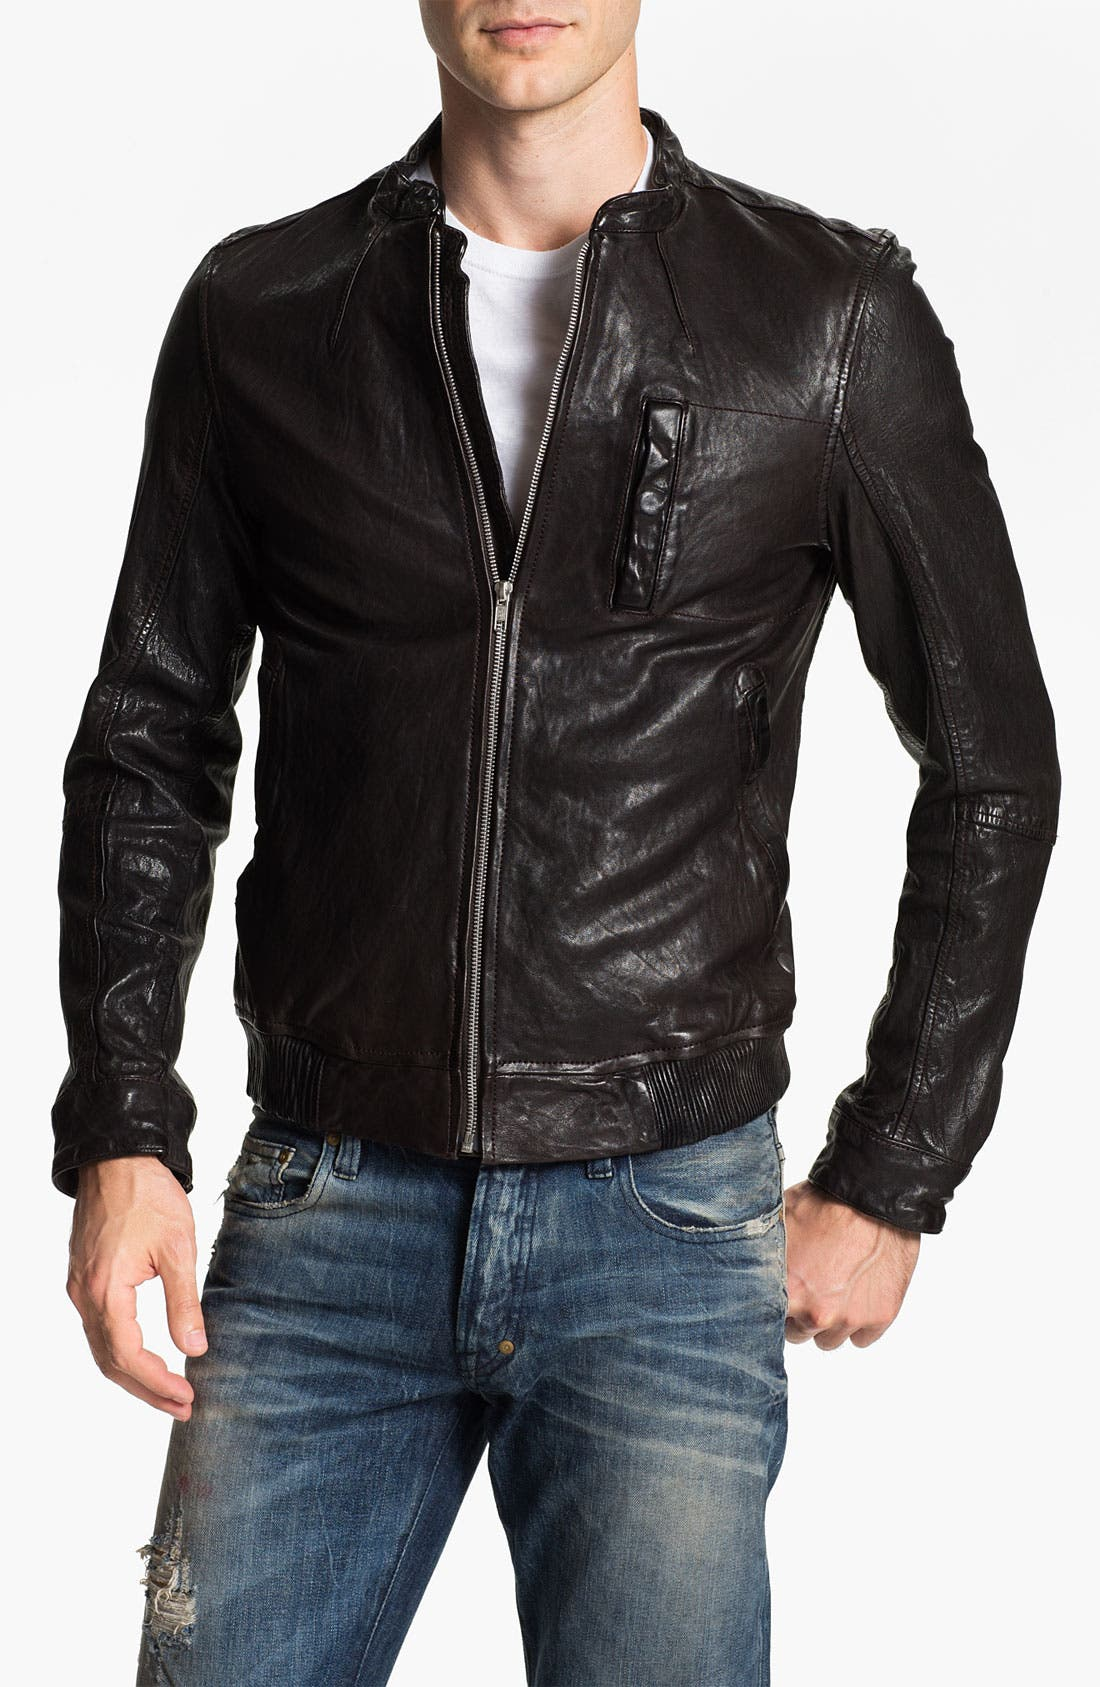 Main Image - PLECTRUM by Ben Sherman Leather Moto Jacket